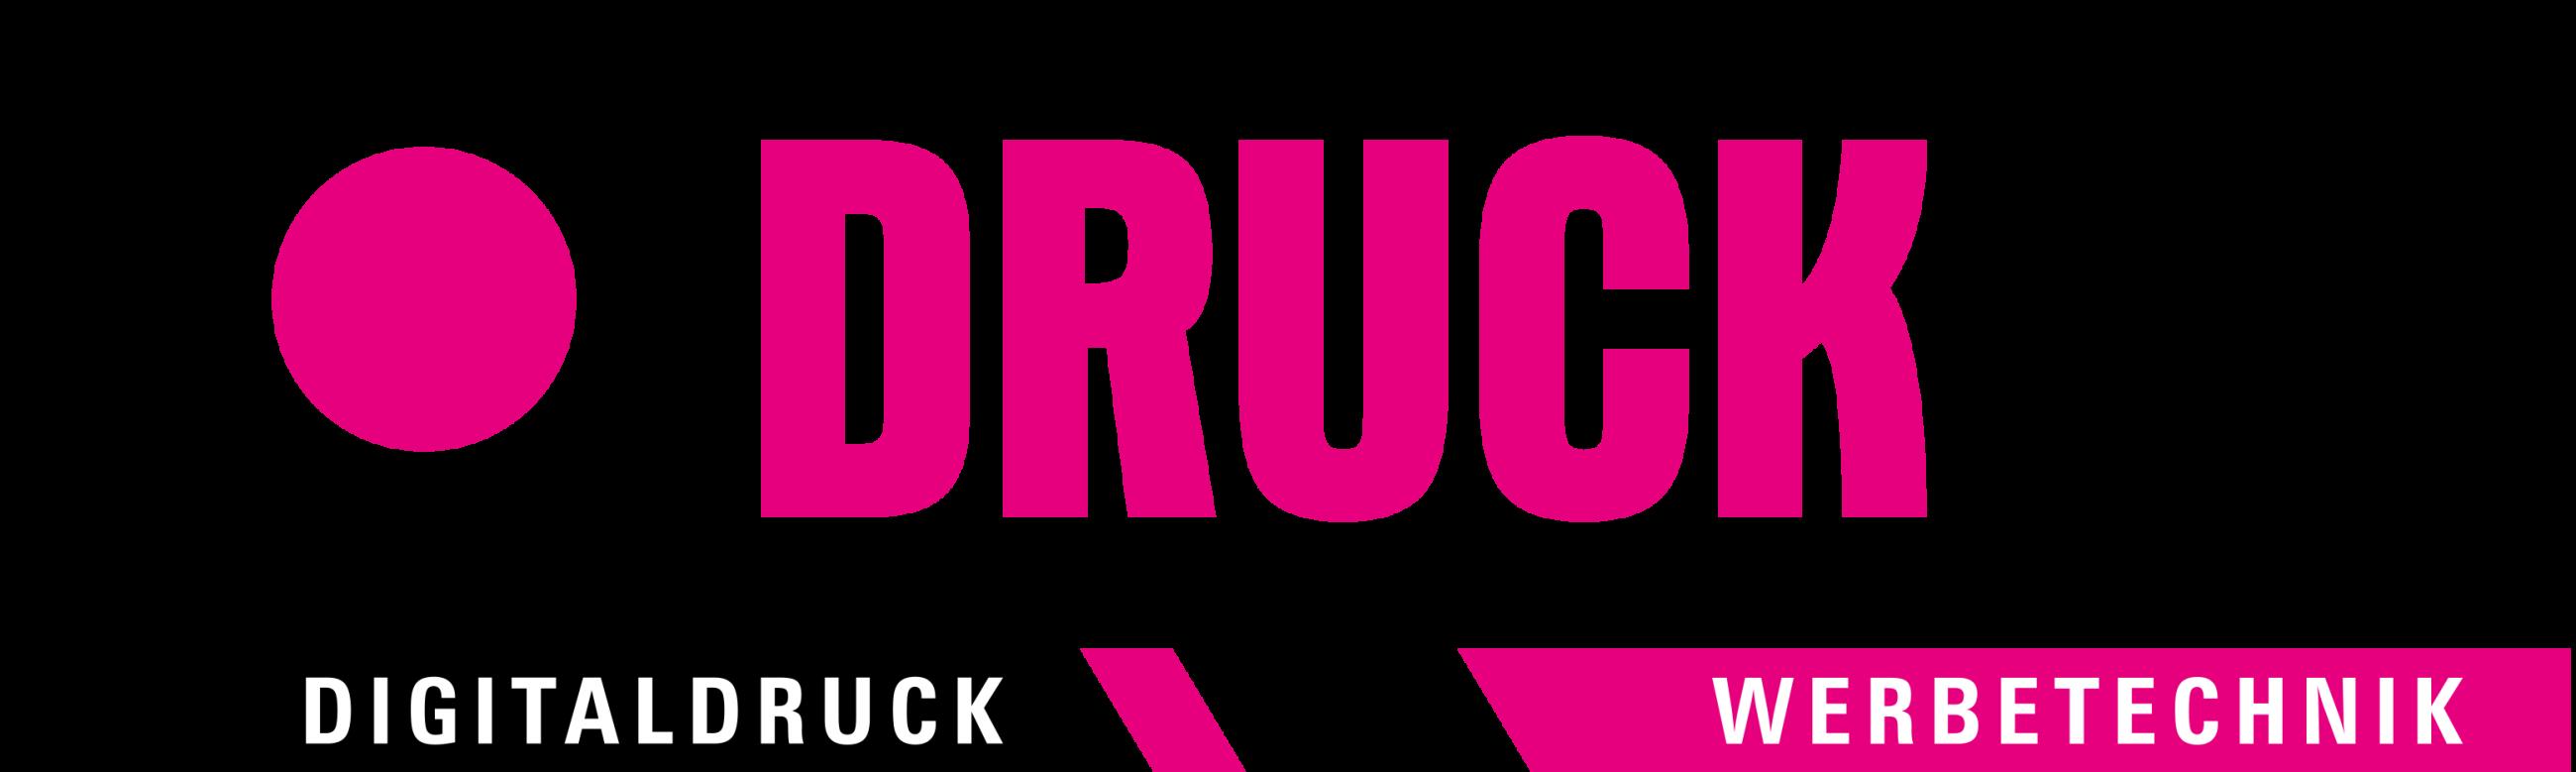 Druck69 Home